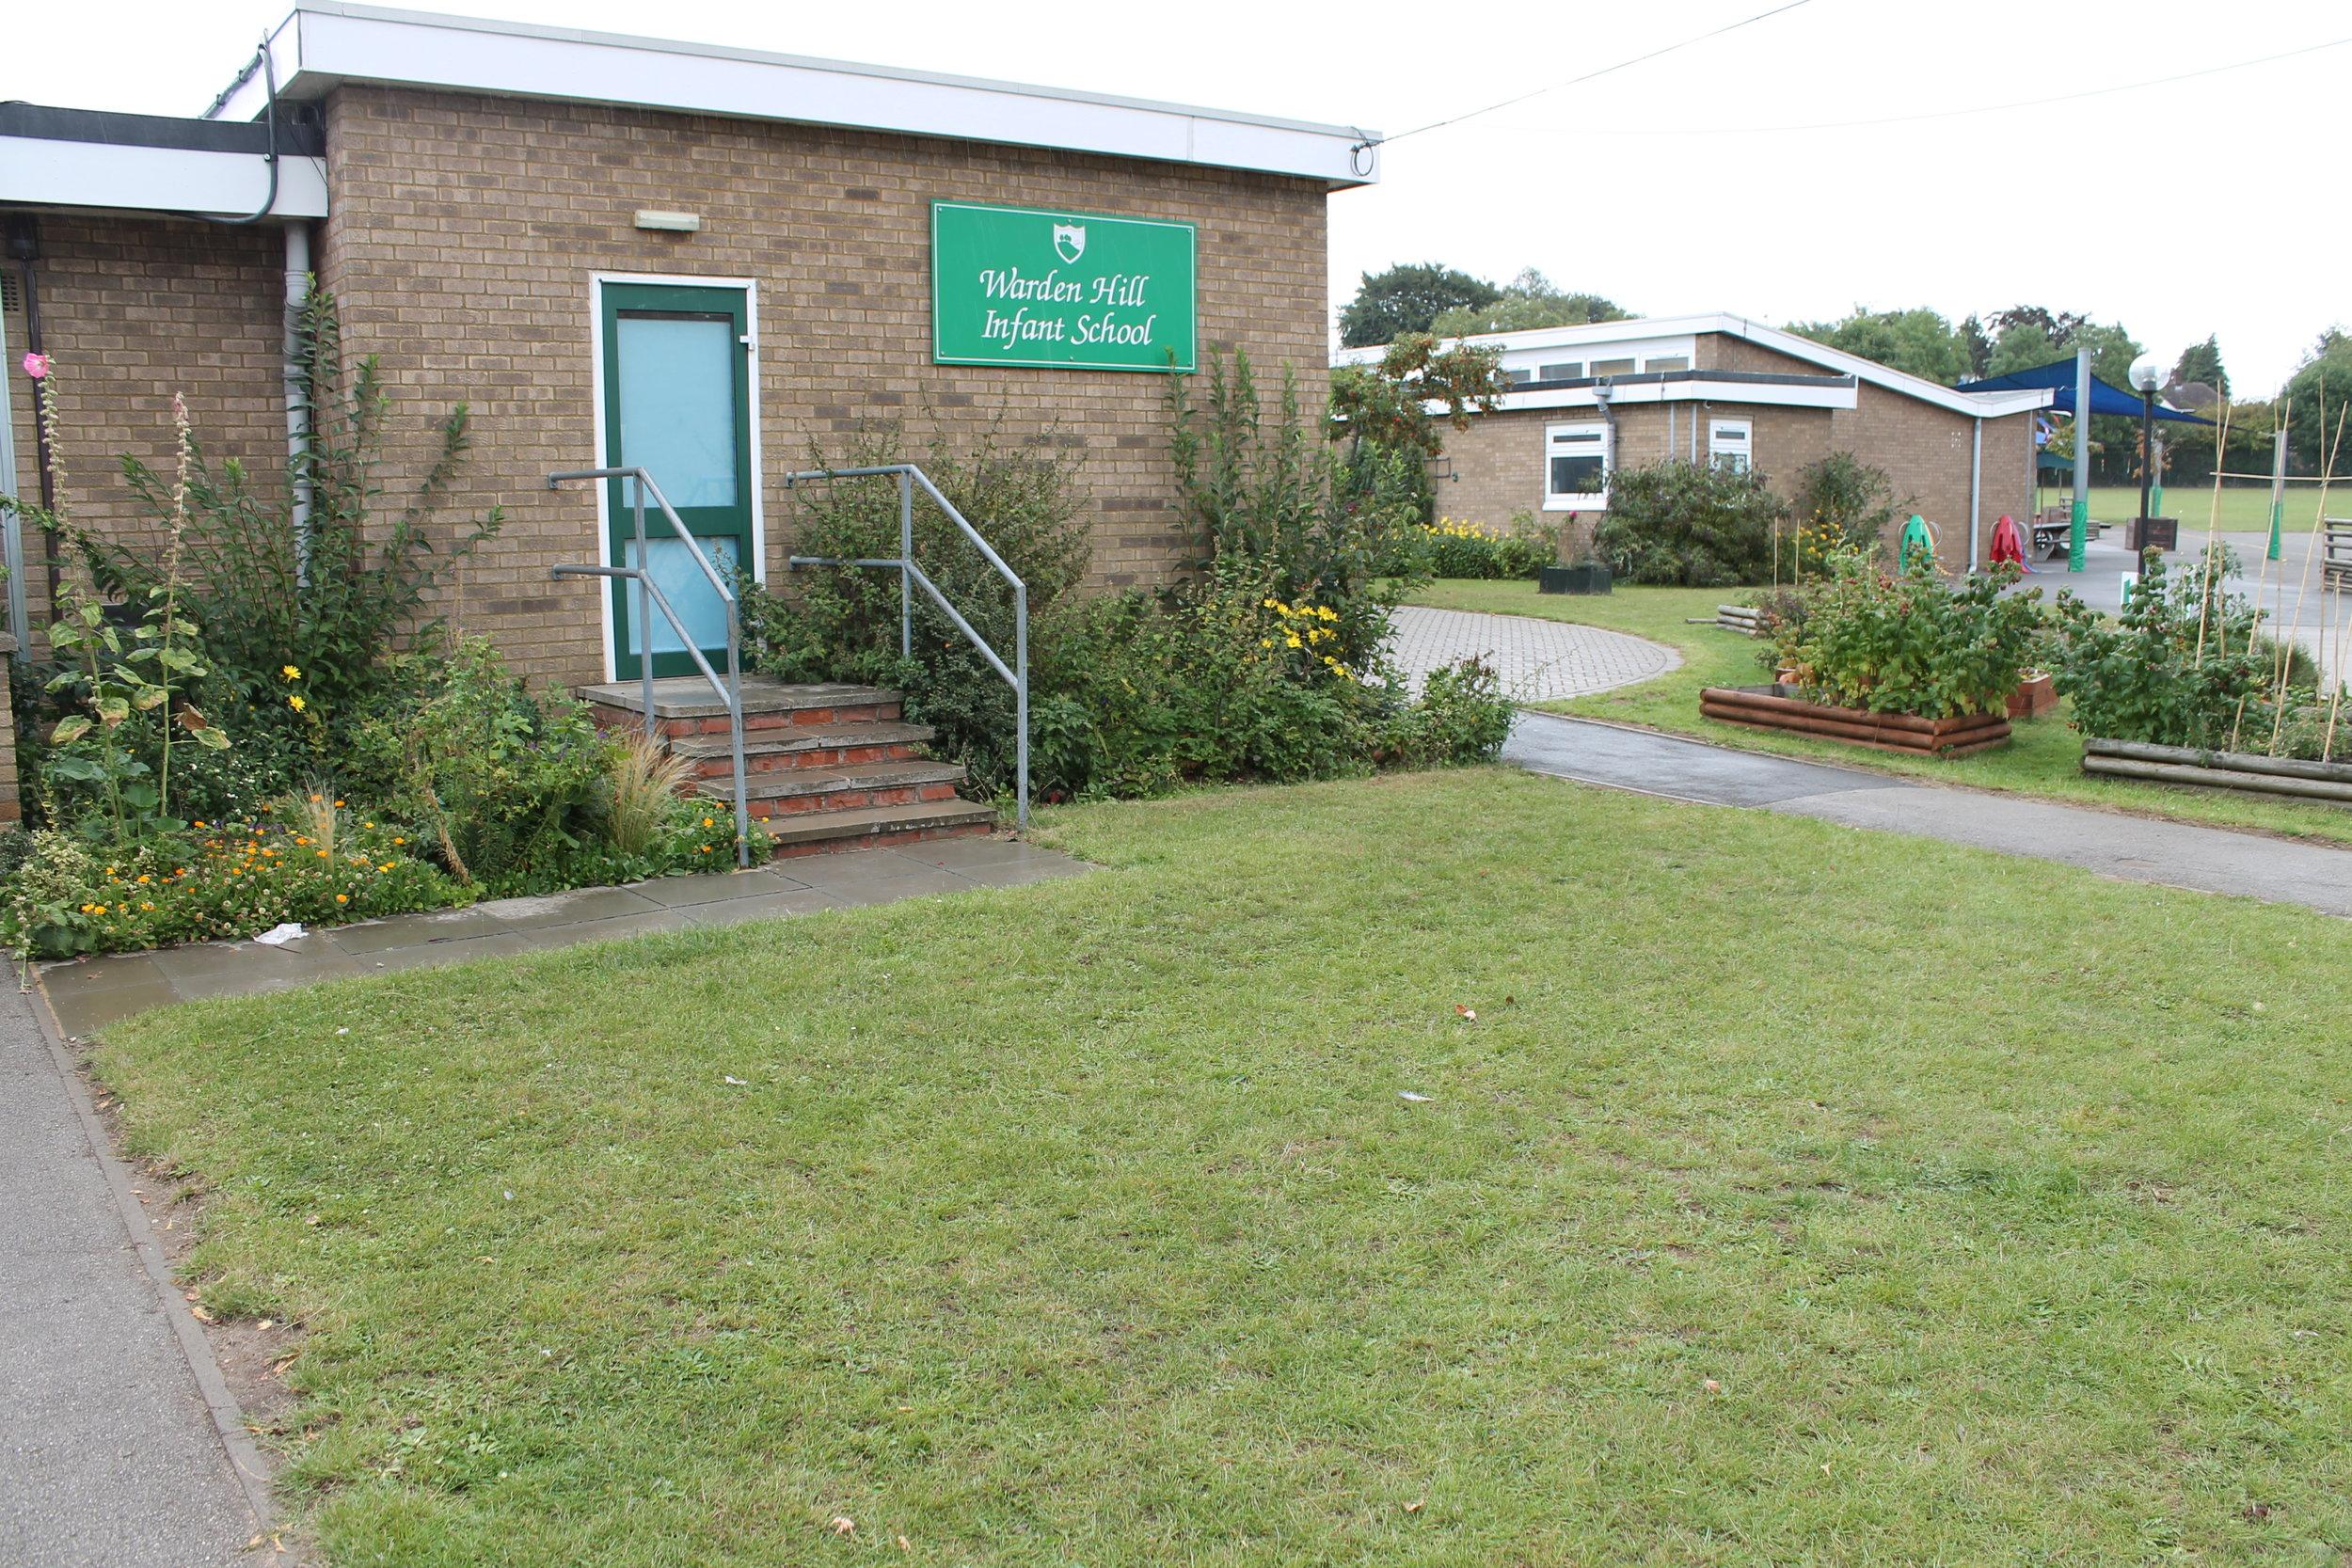 WARDEN HILL SCHOOL -